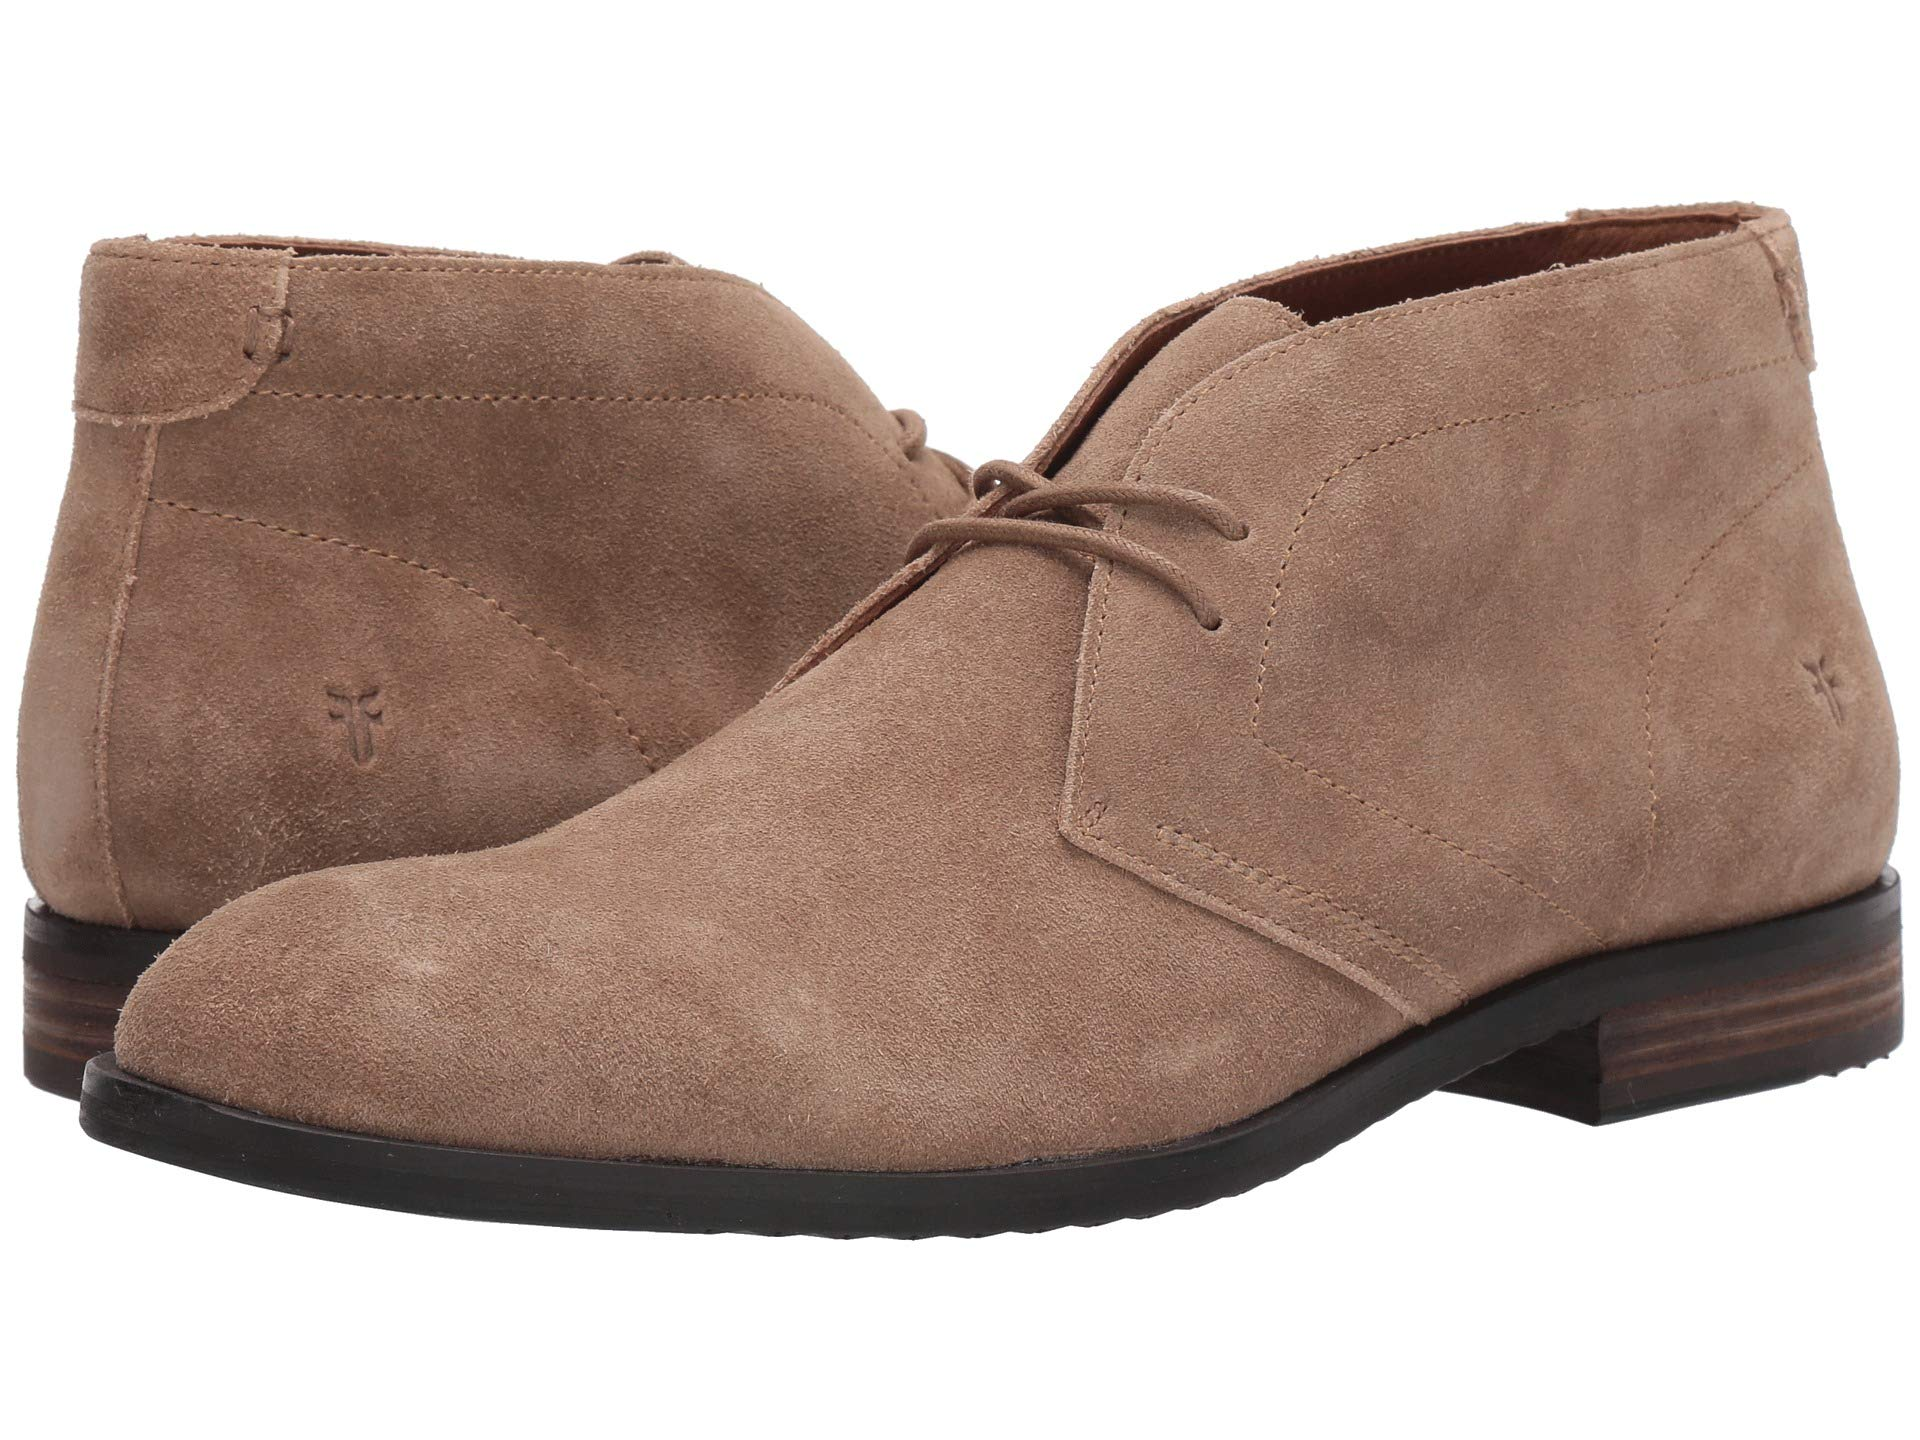 FRYE 弗莱 Scott 男式短靴 42码1.2折$26.99 海淘转运到手约¥305